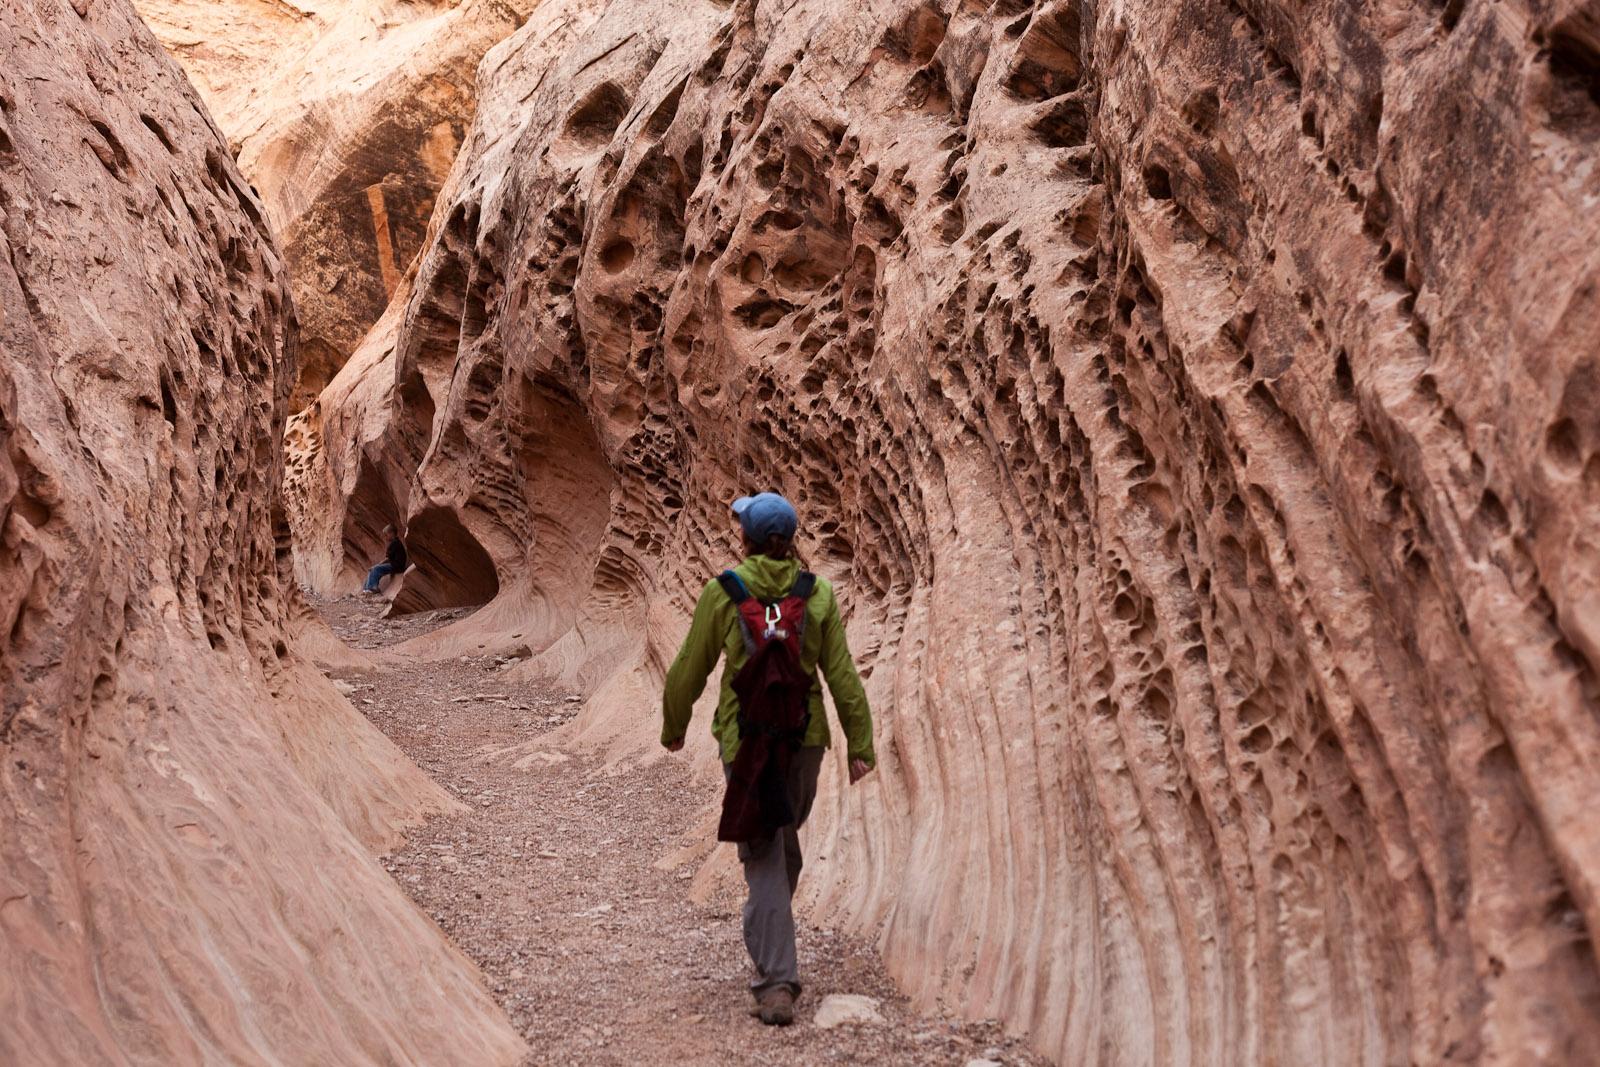 Little Wild Horse Canyon (photo courtesy Wikimedia Commons)